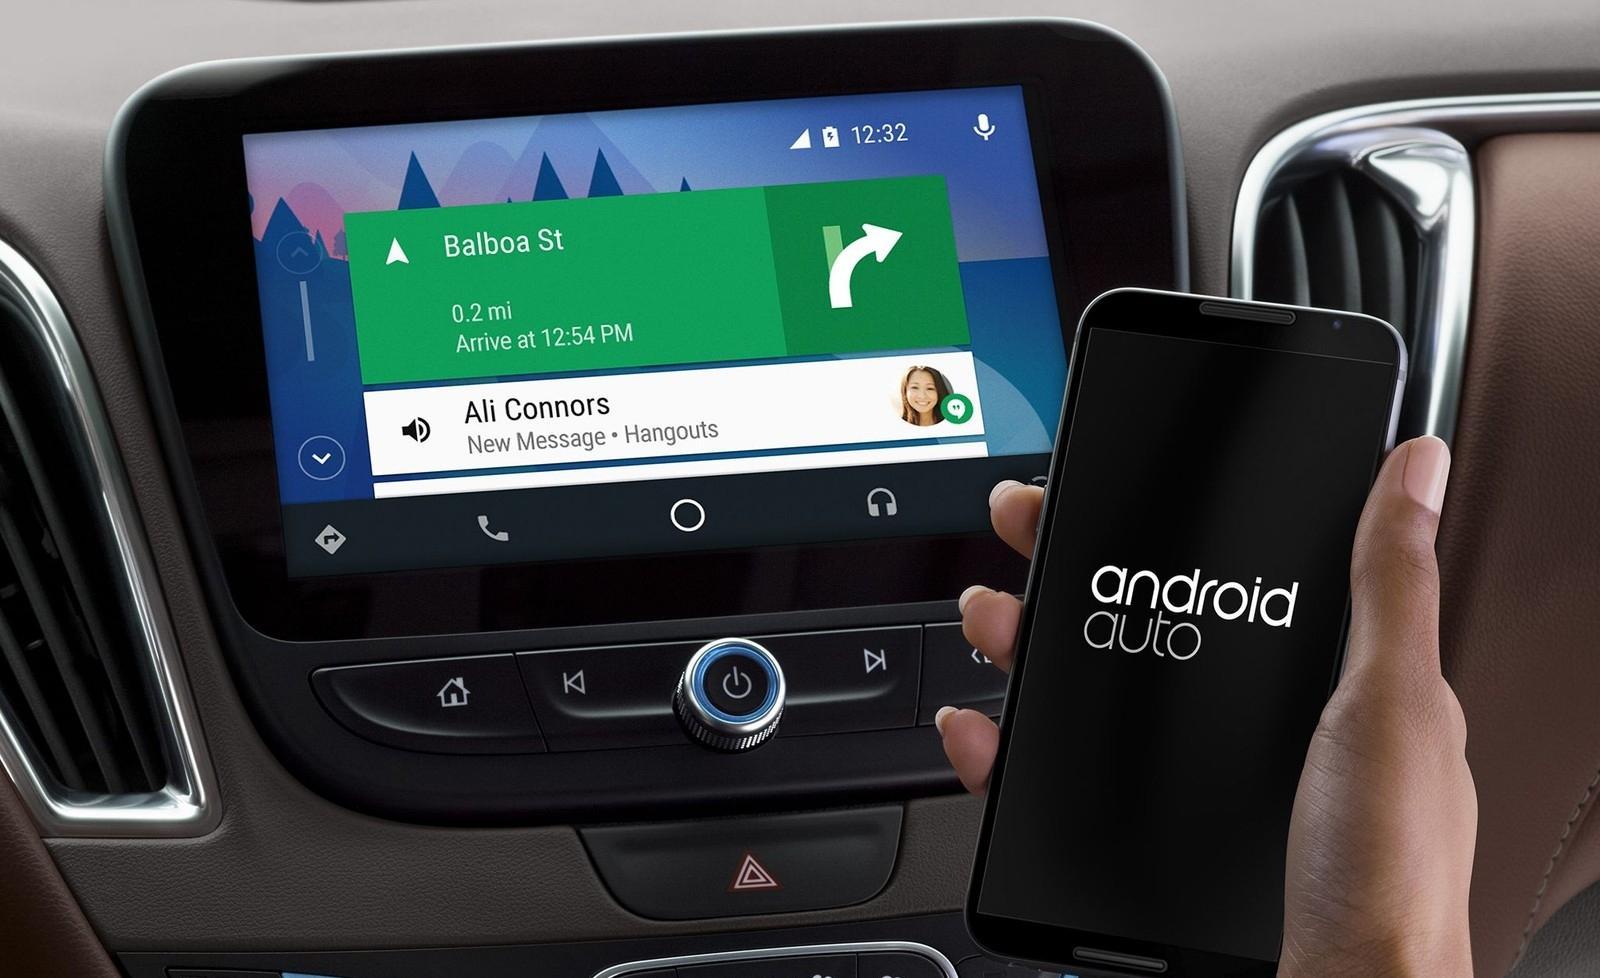 Android Auto Display Winnipeg